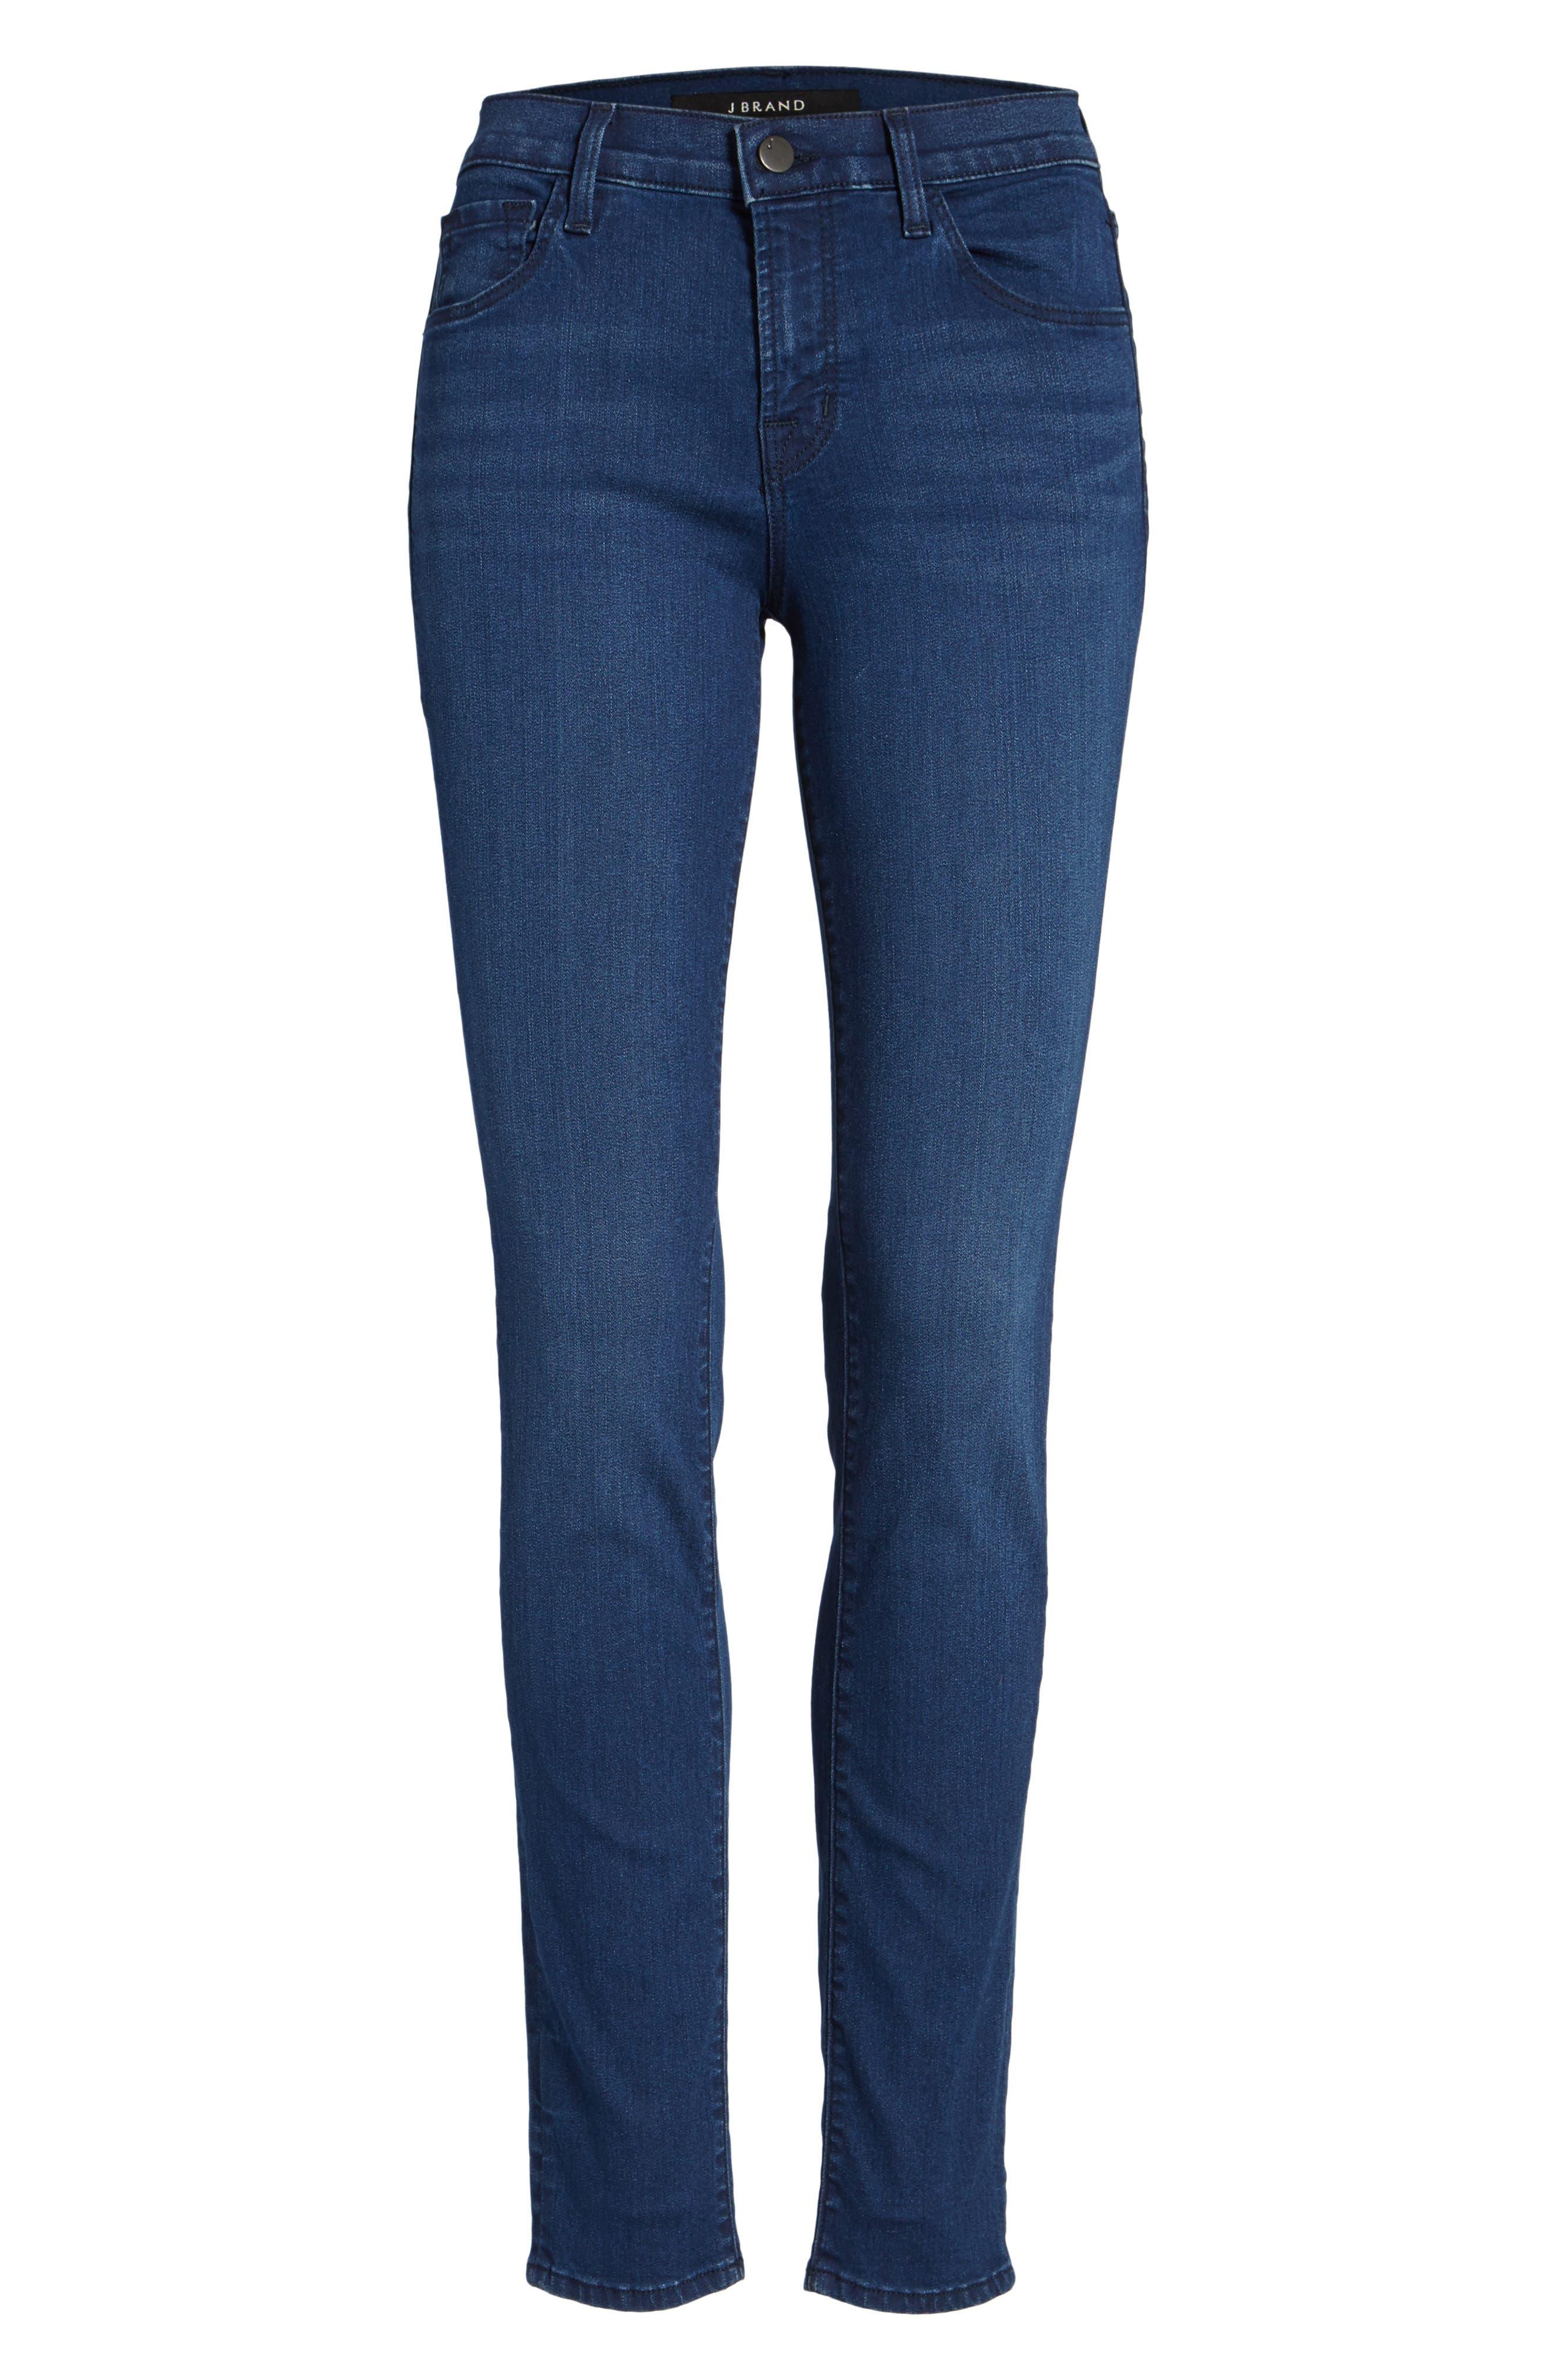 '811' Ankle Skinny Jeans,                             Alternate thumbnail 28, color,